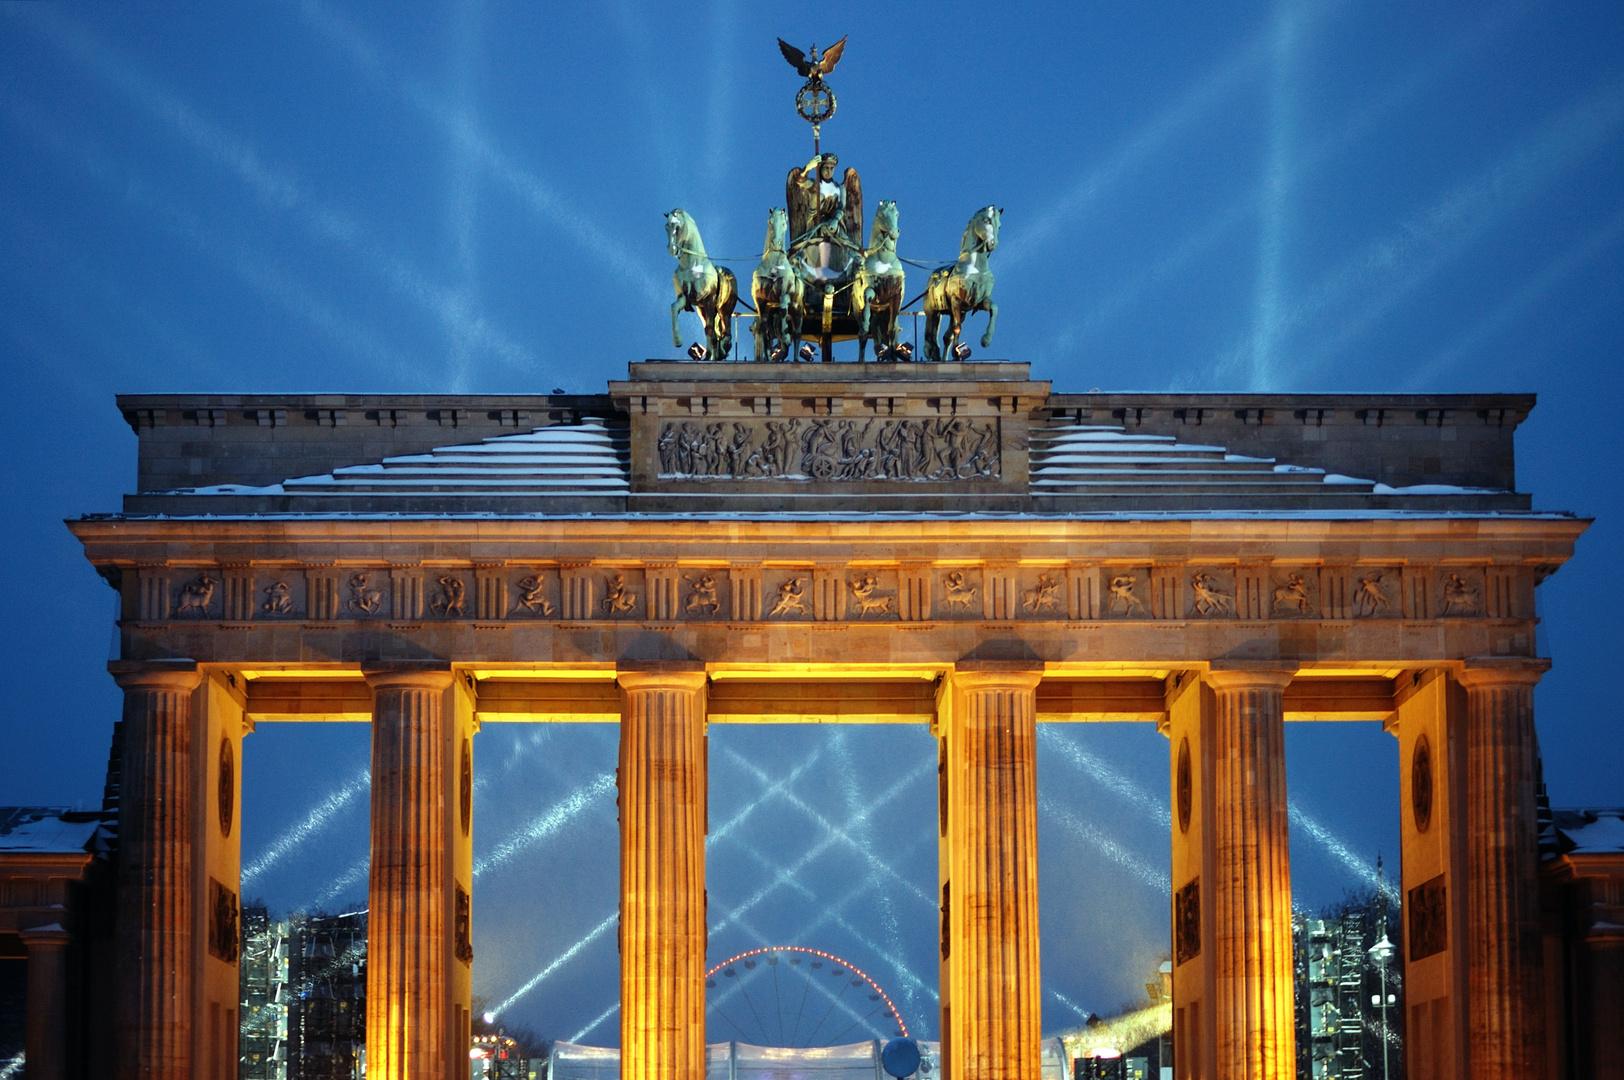 Silvester 2010 am Brandenburger Tor